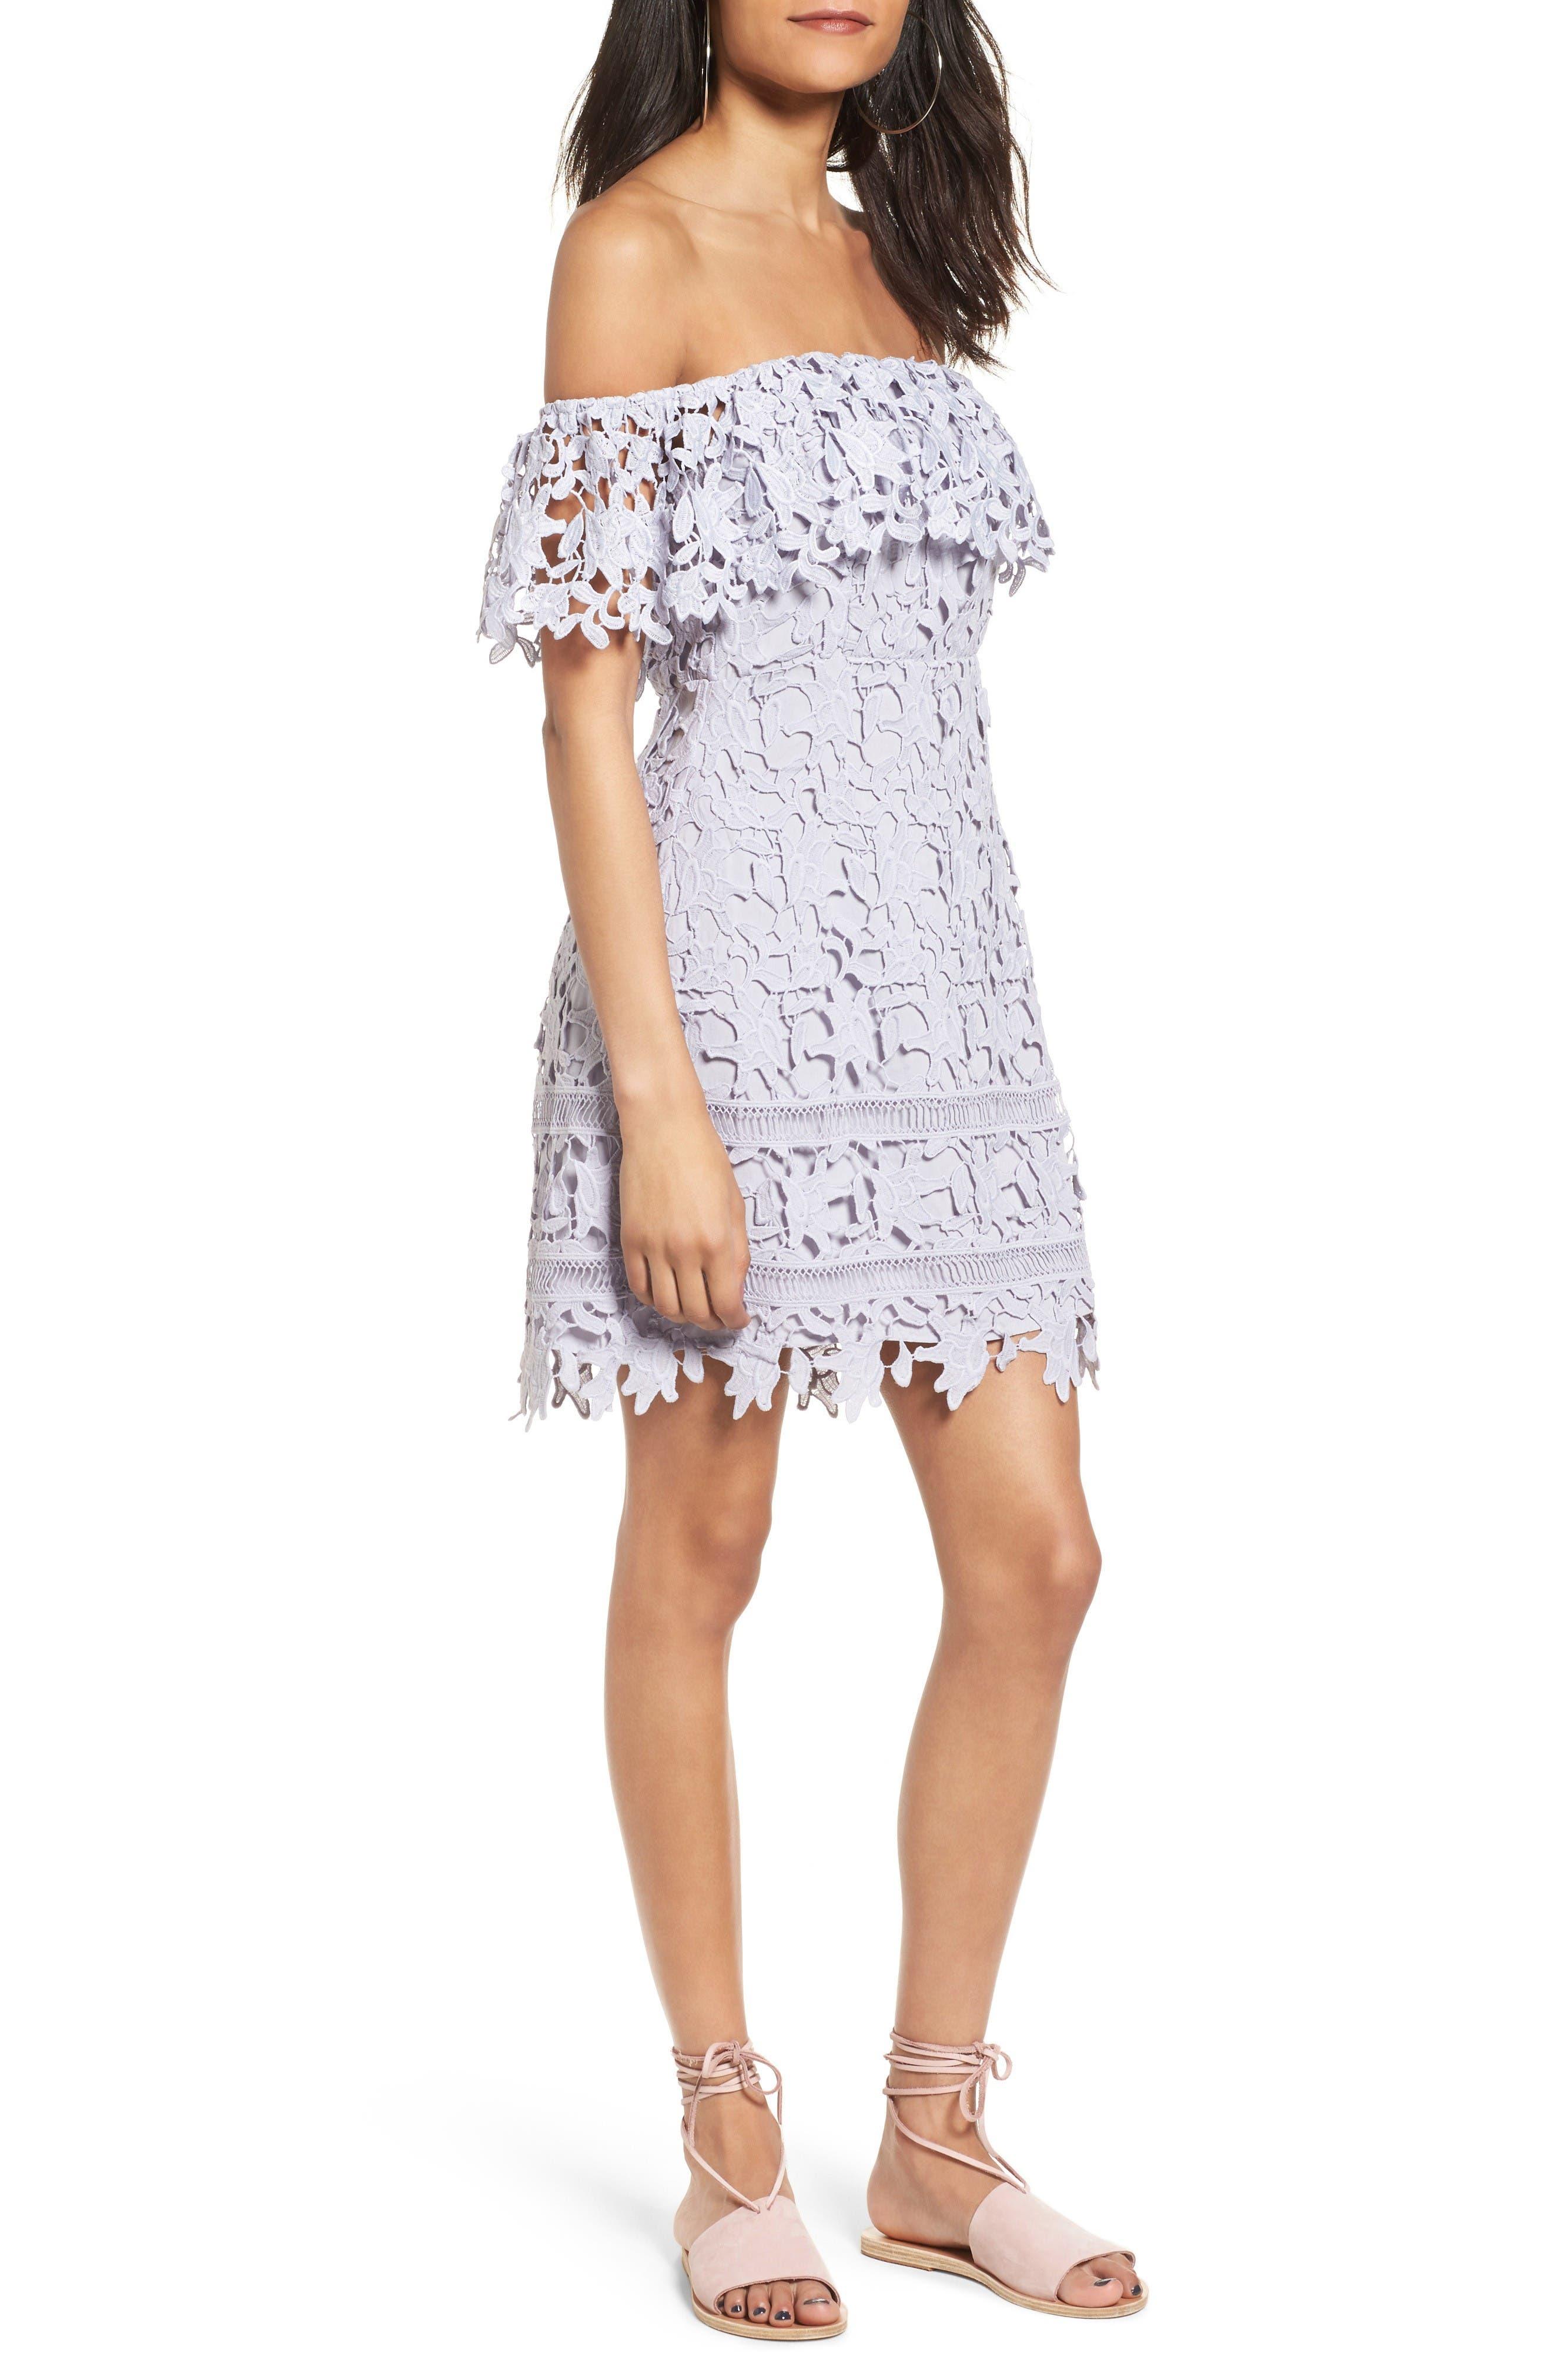 Alternate Image 1 Selected - ASTR the Label Off the Shoulder Lace Minidress